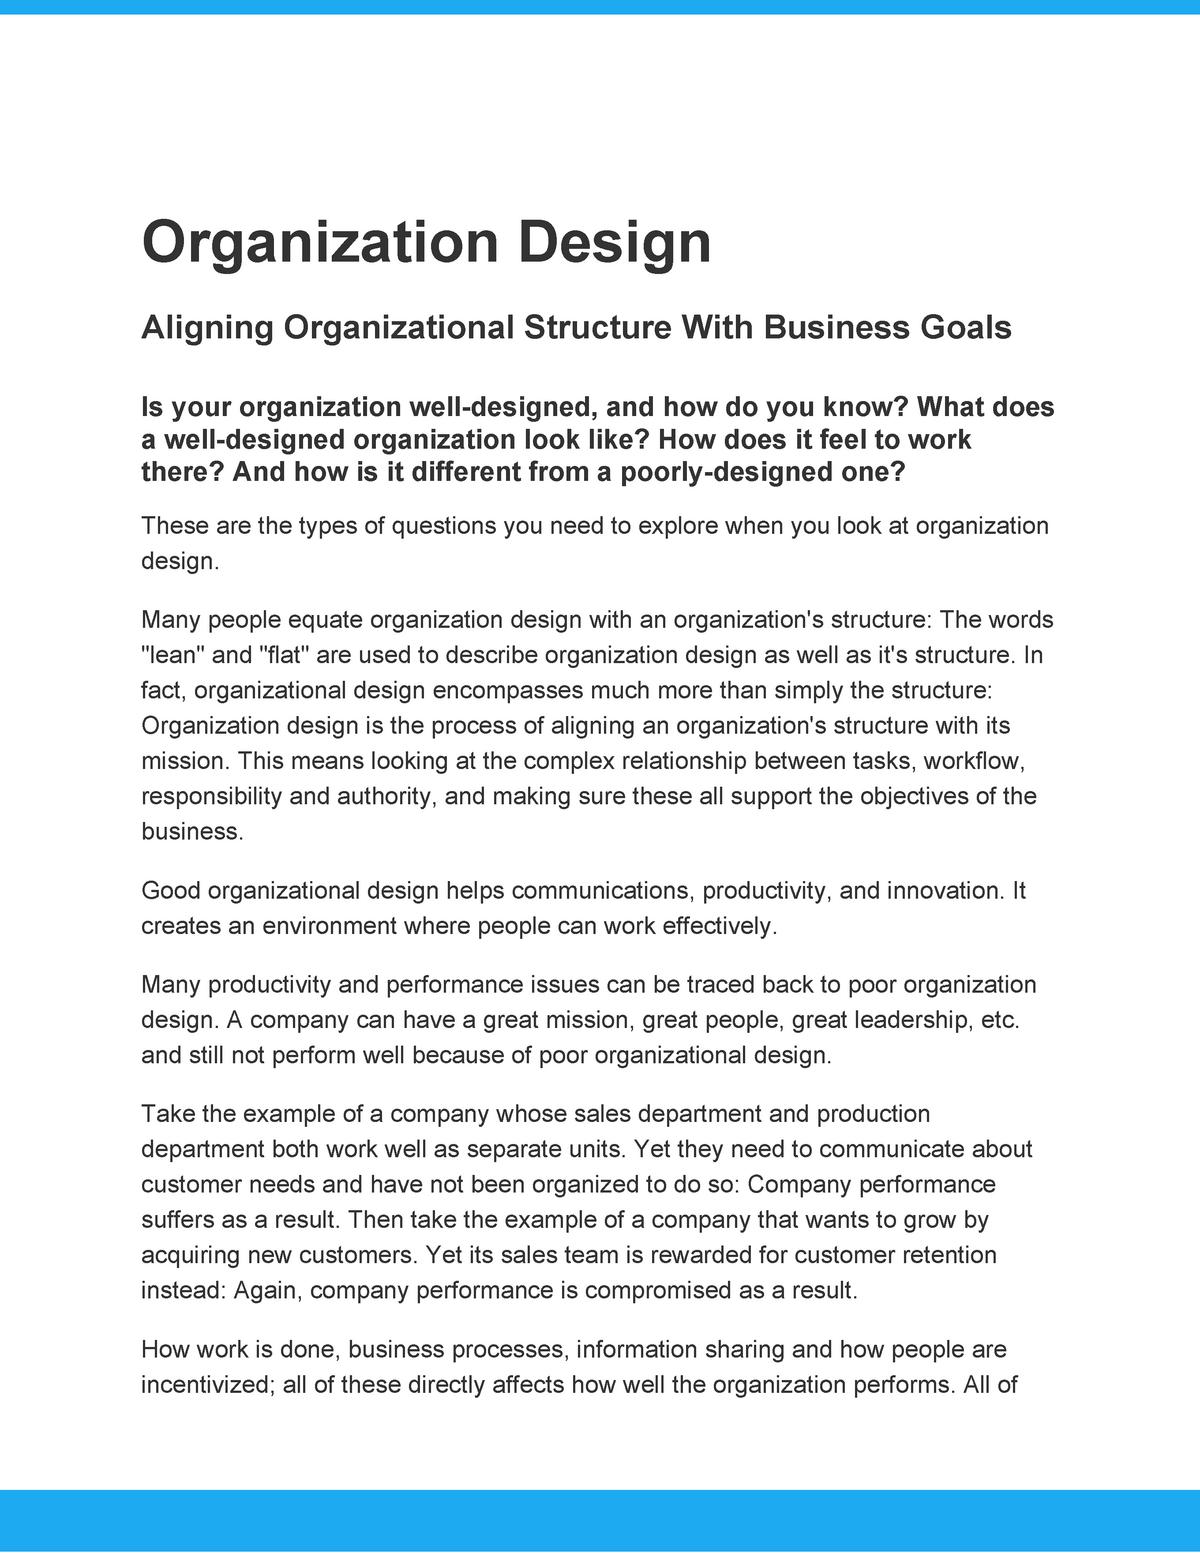 Organizational Design Mba2 1 Studocu